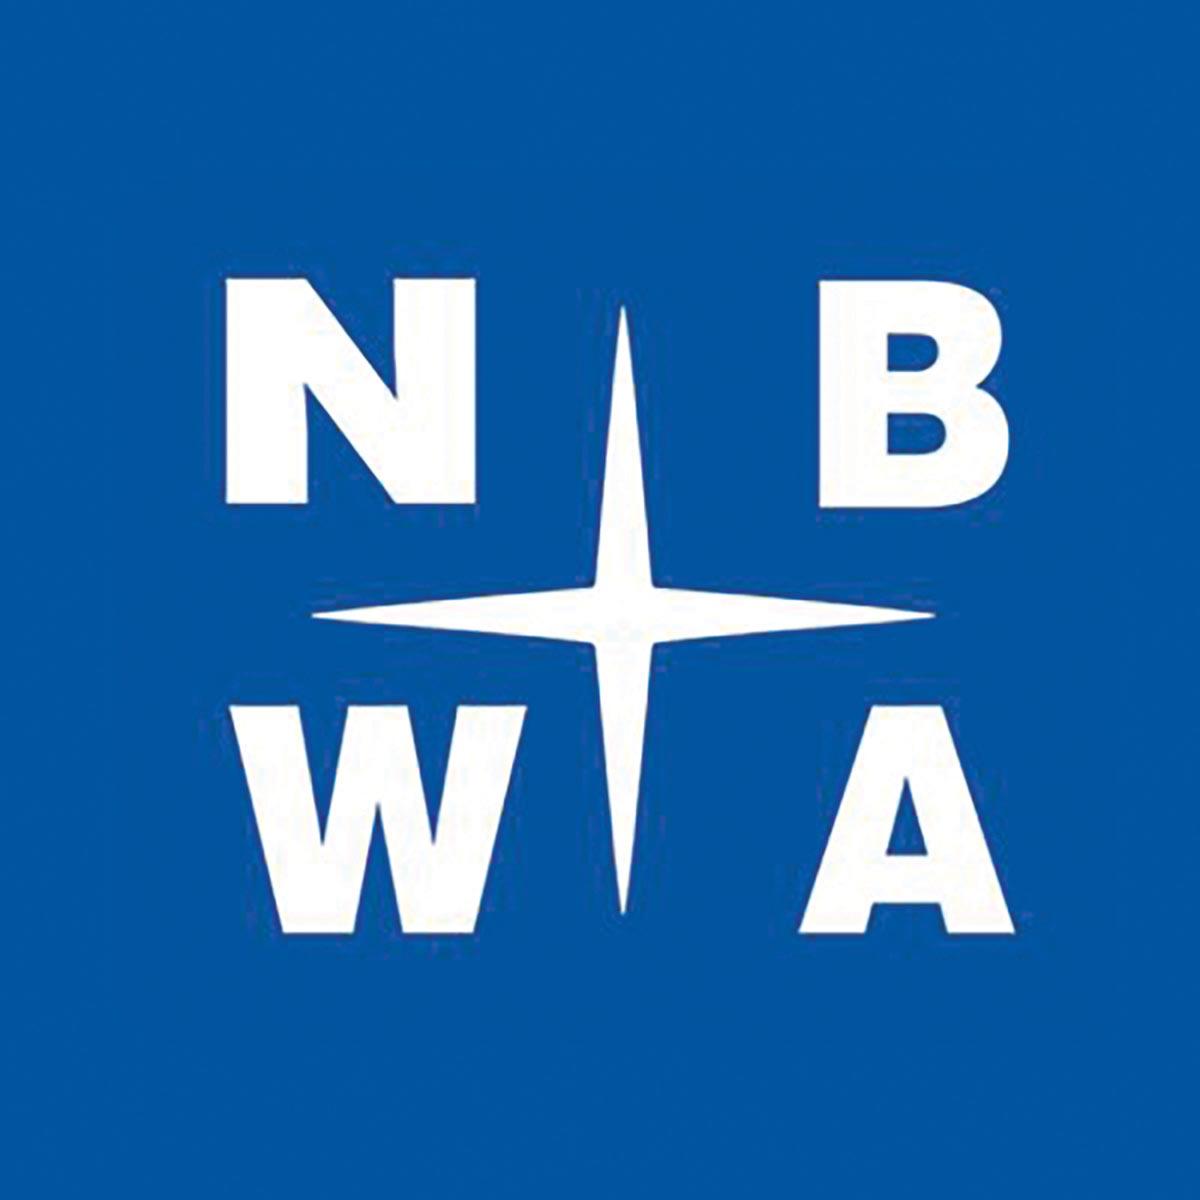 NBWA Highlights Beer Industry's Rhode Island Impact